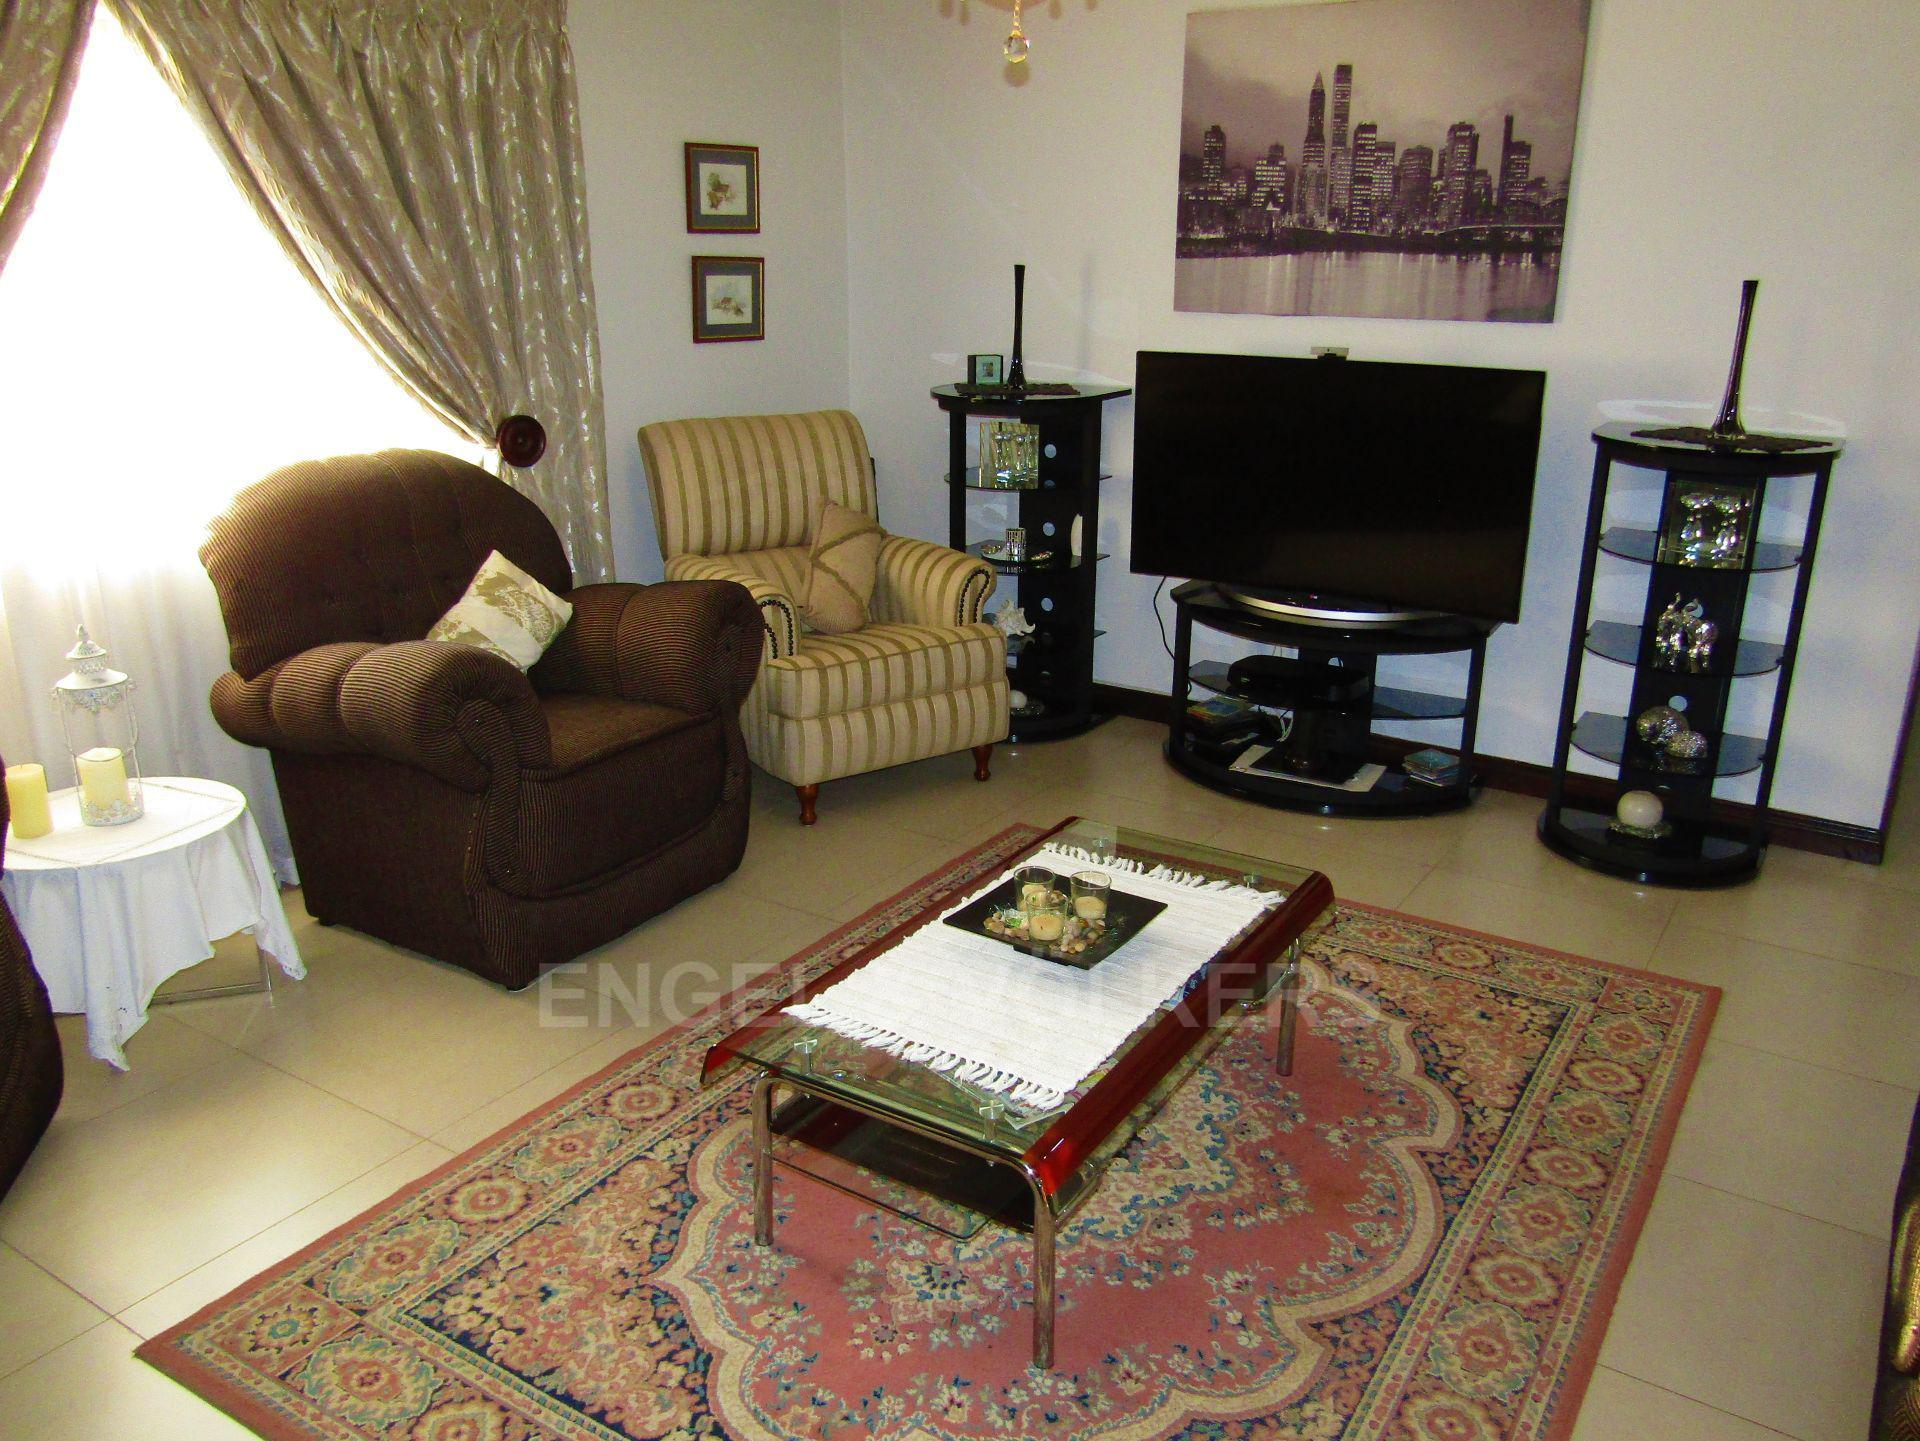 Lifestyle Estate property for sale. Ref No: 13458759. Picture no 5